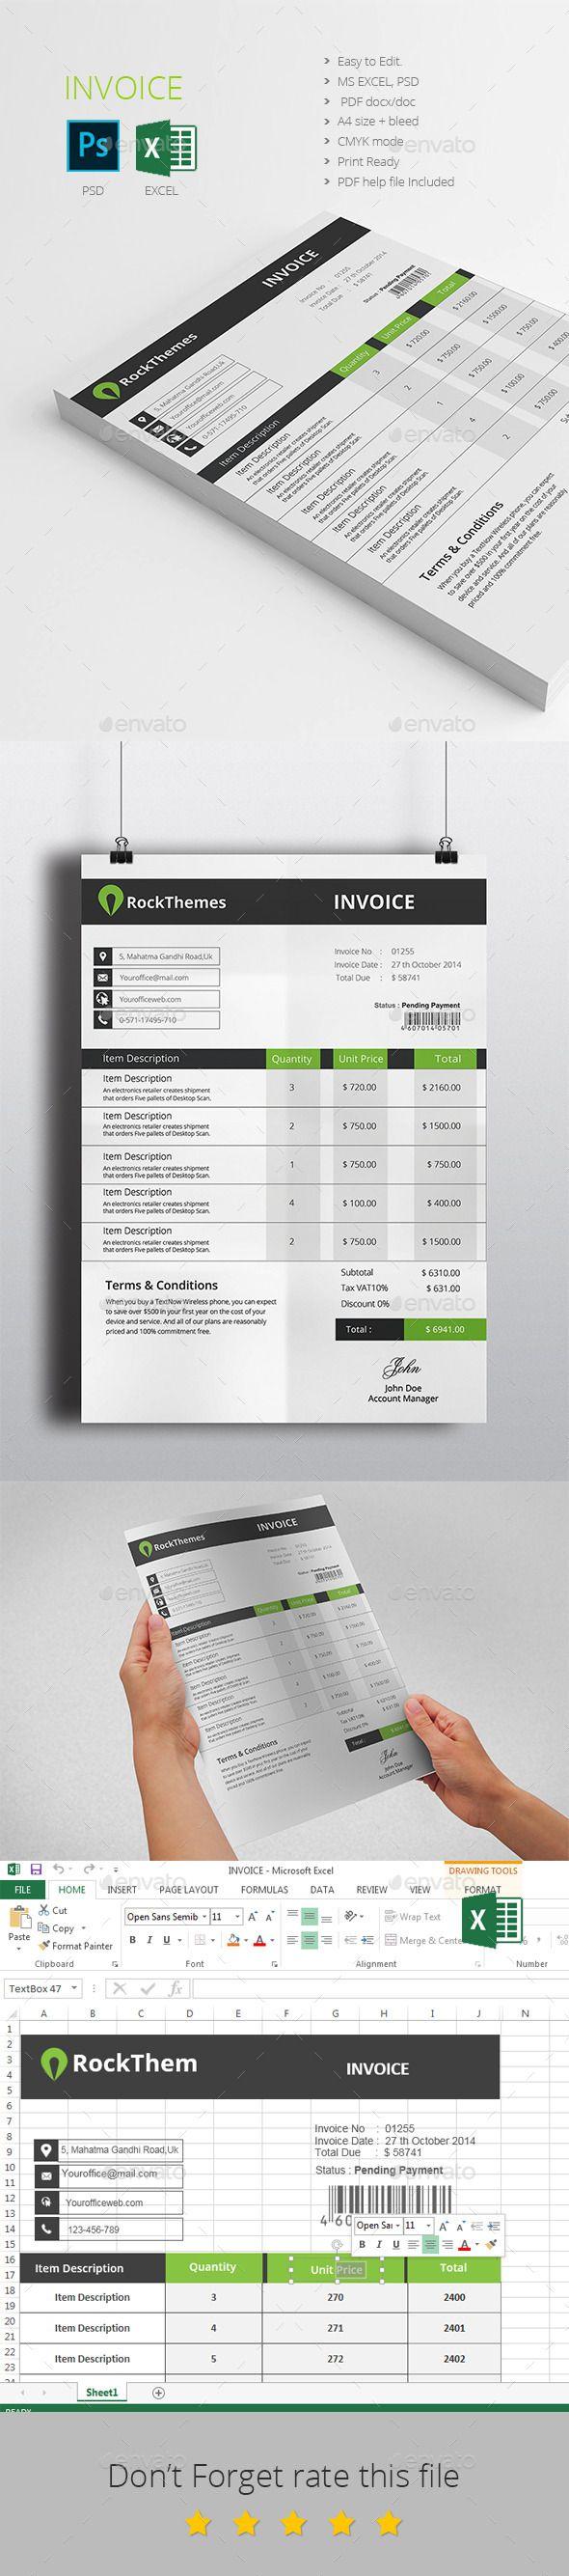 Invoice Design Tempalte Download httpgraphicrivernetiteminvoice 9 best